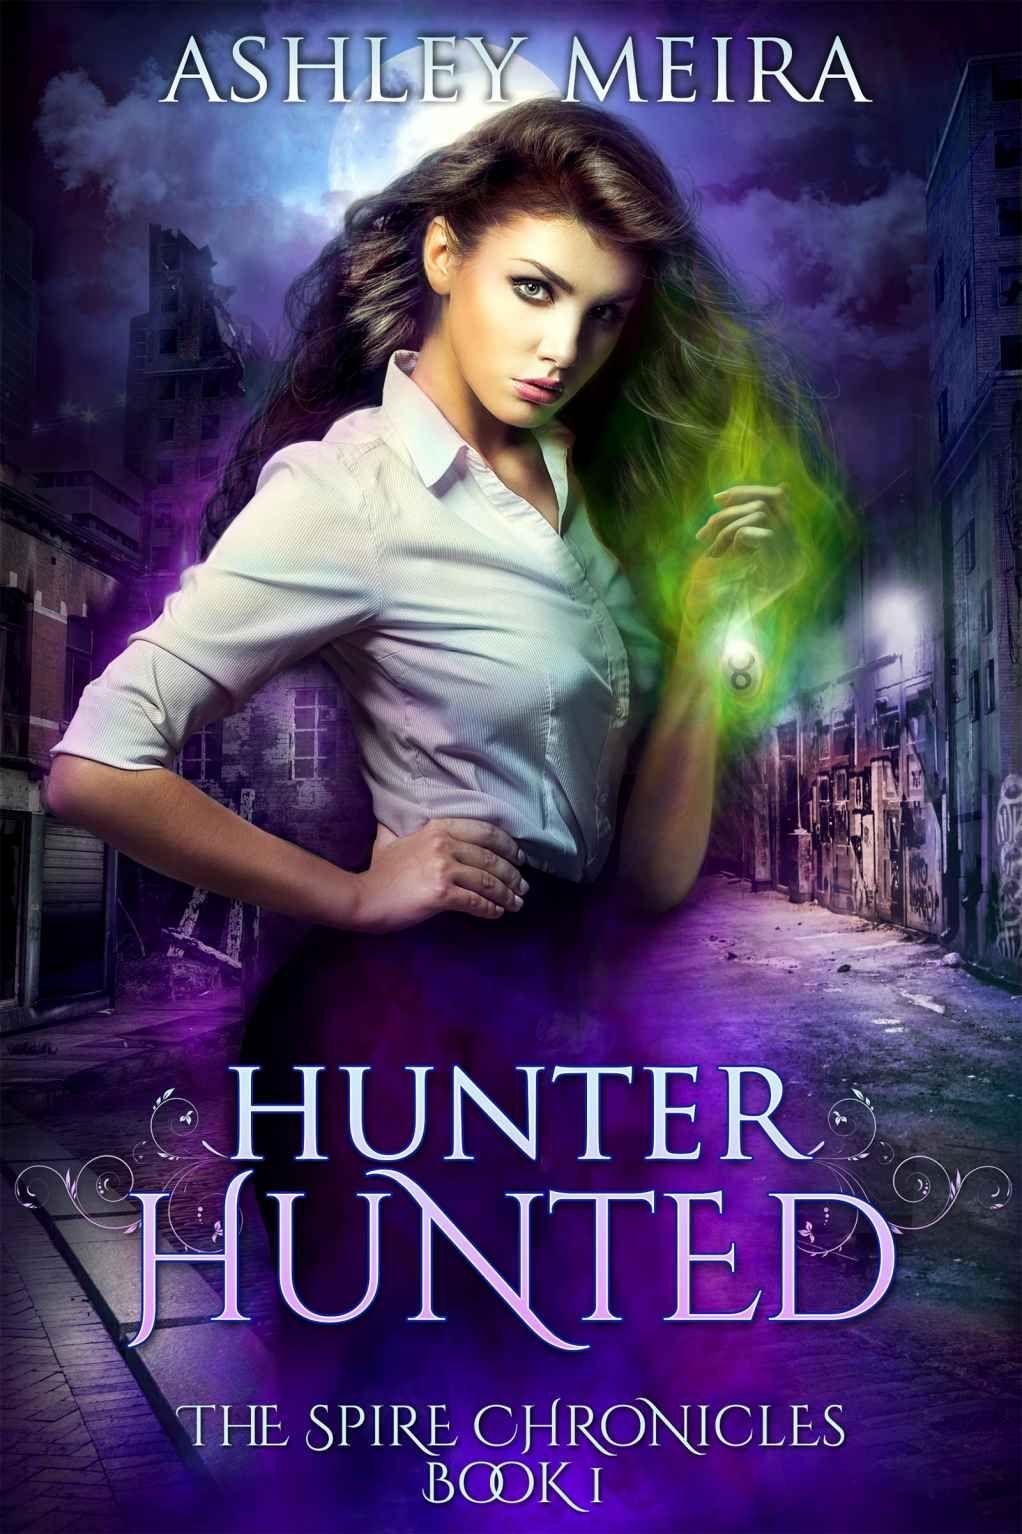 Hunter hunted a new adult fantasy novel the spire